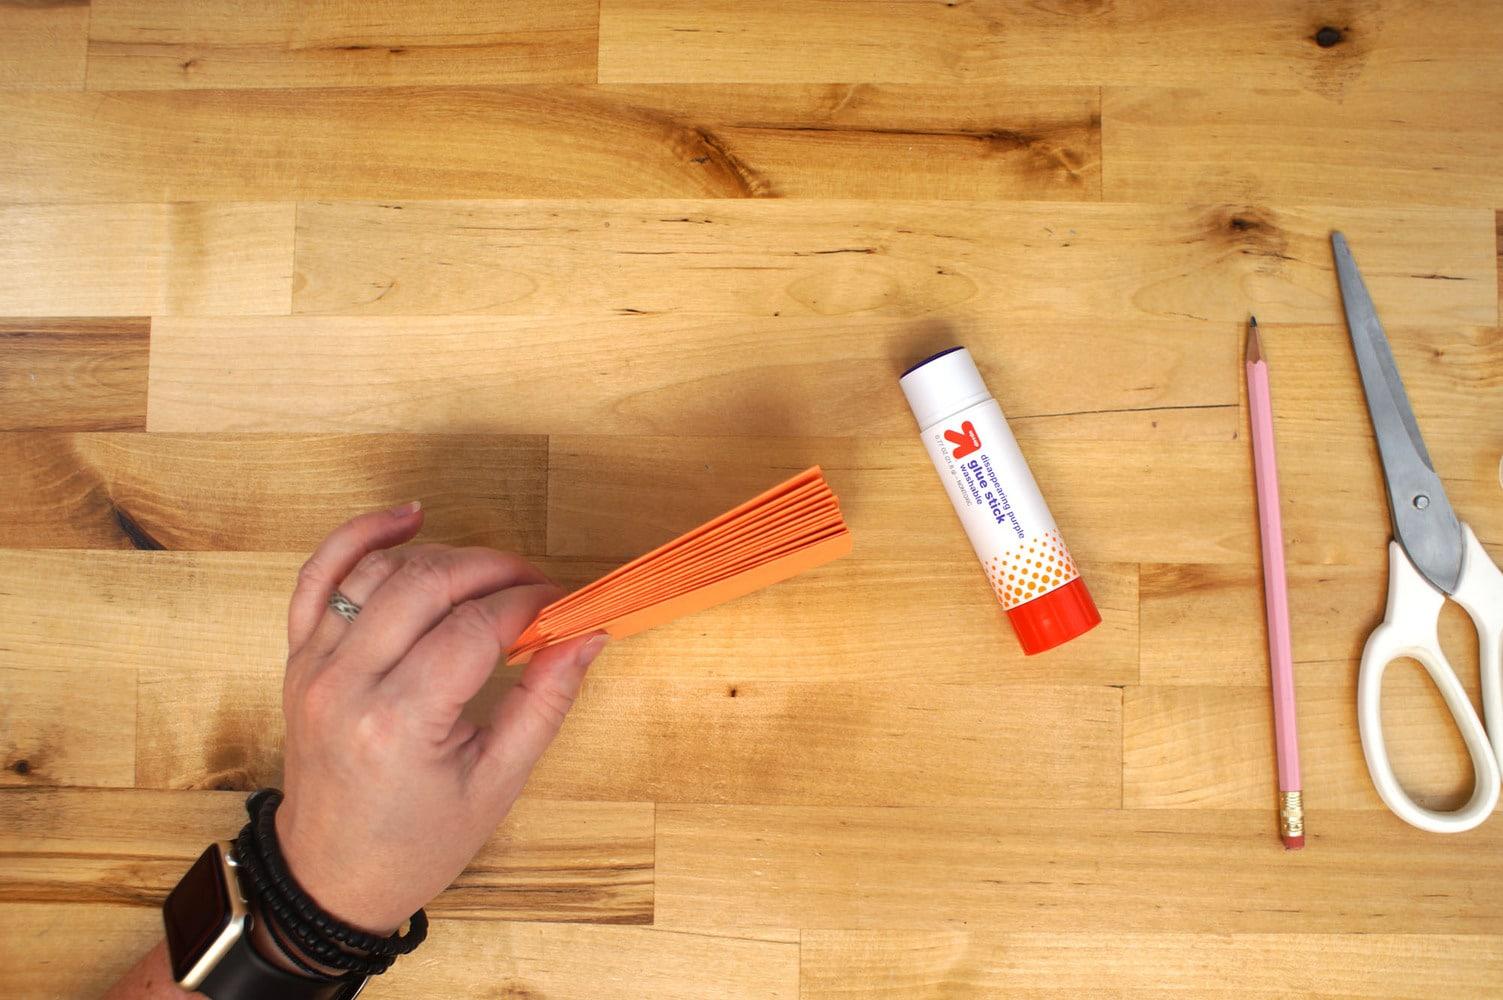 hand holding a stack of orange paper pumpkin slices together for gluing